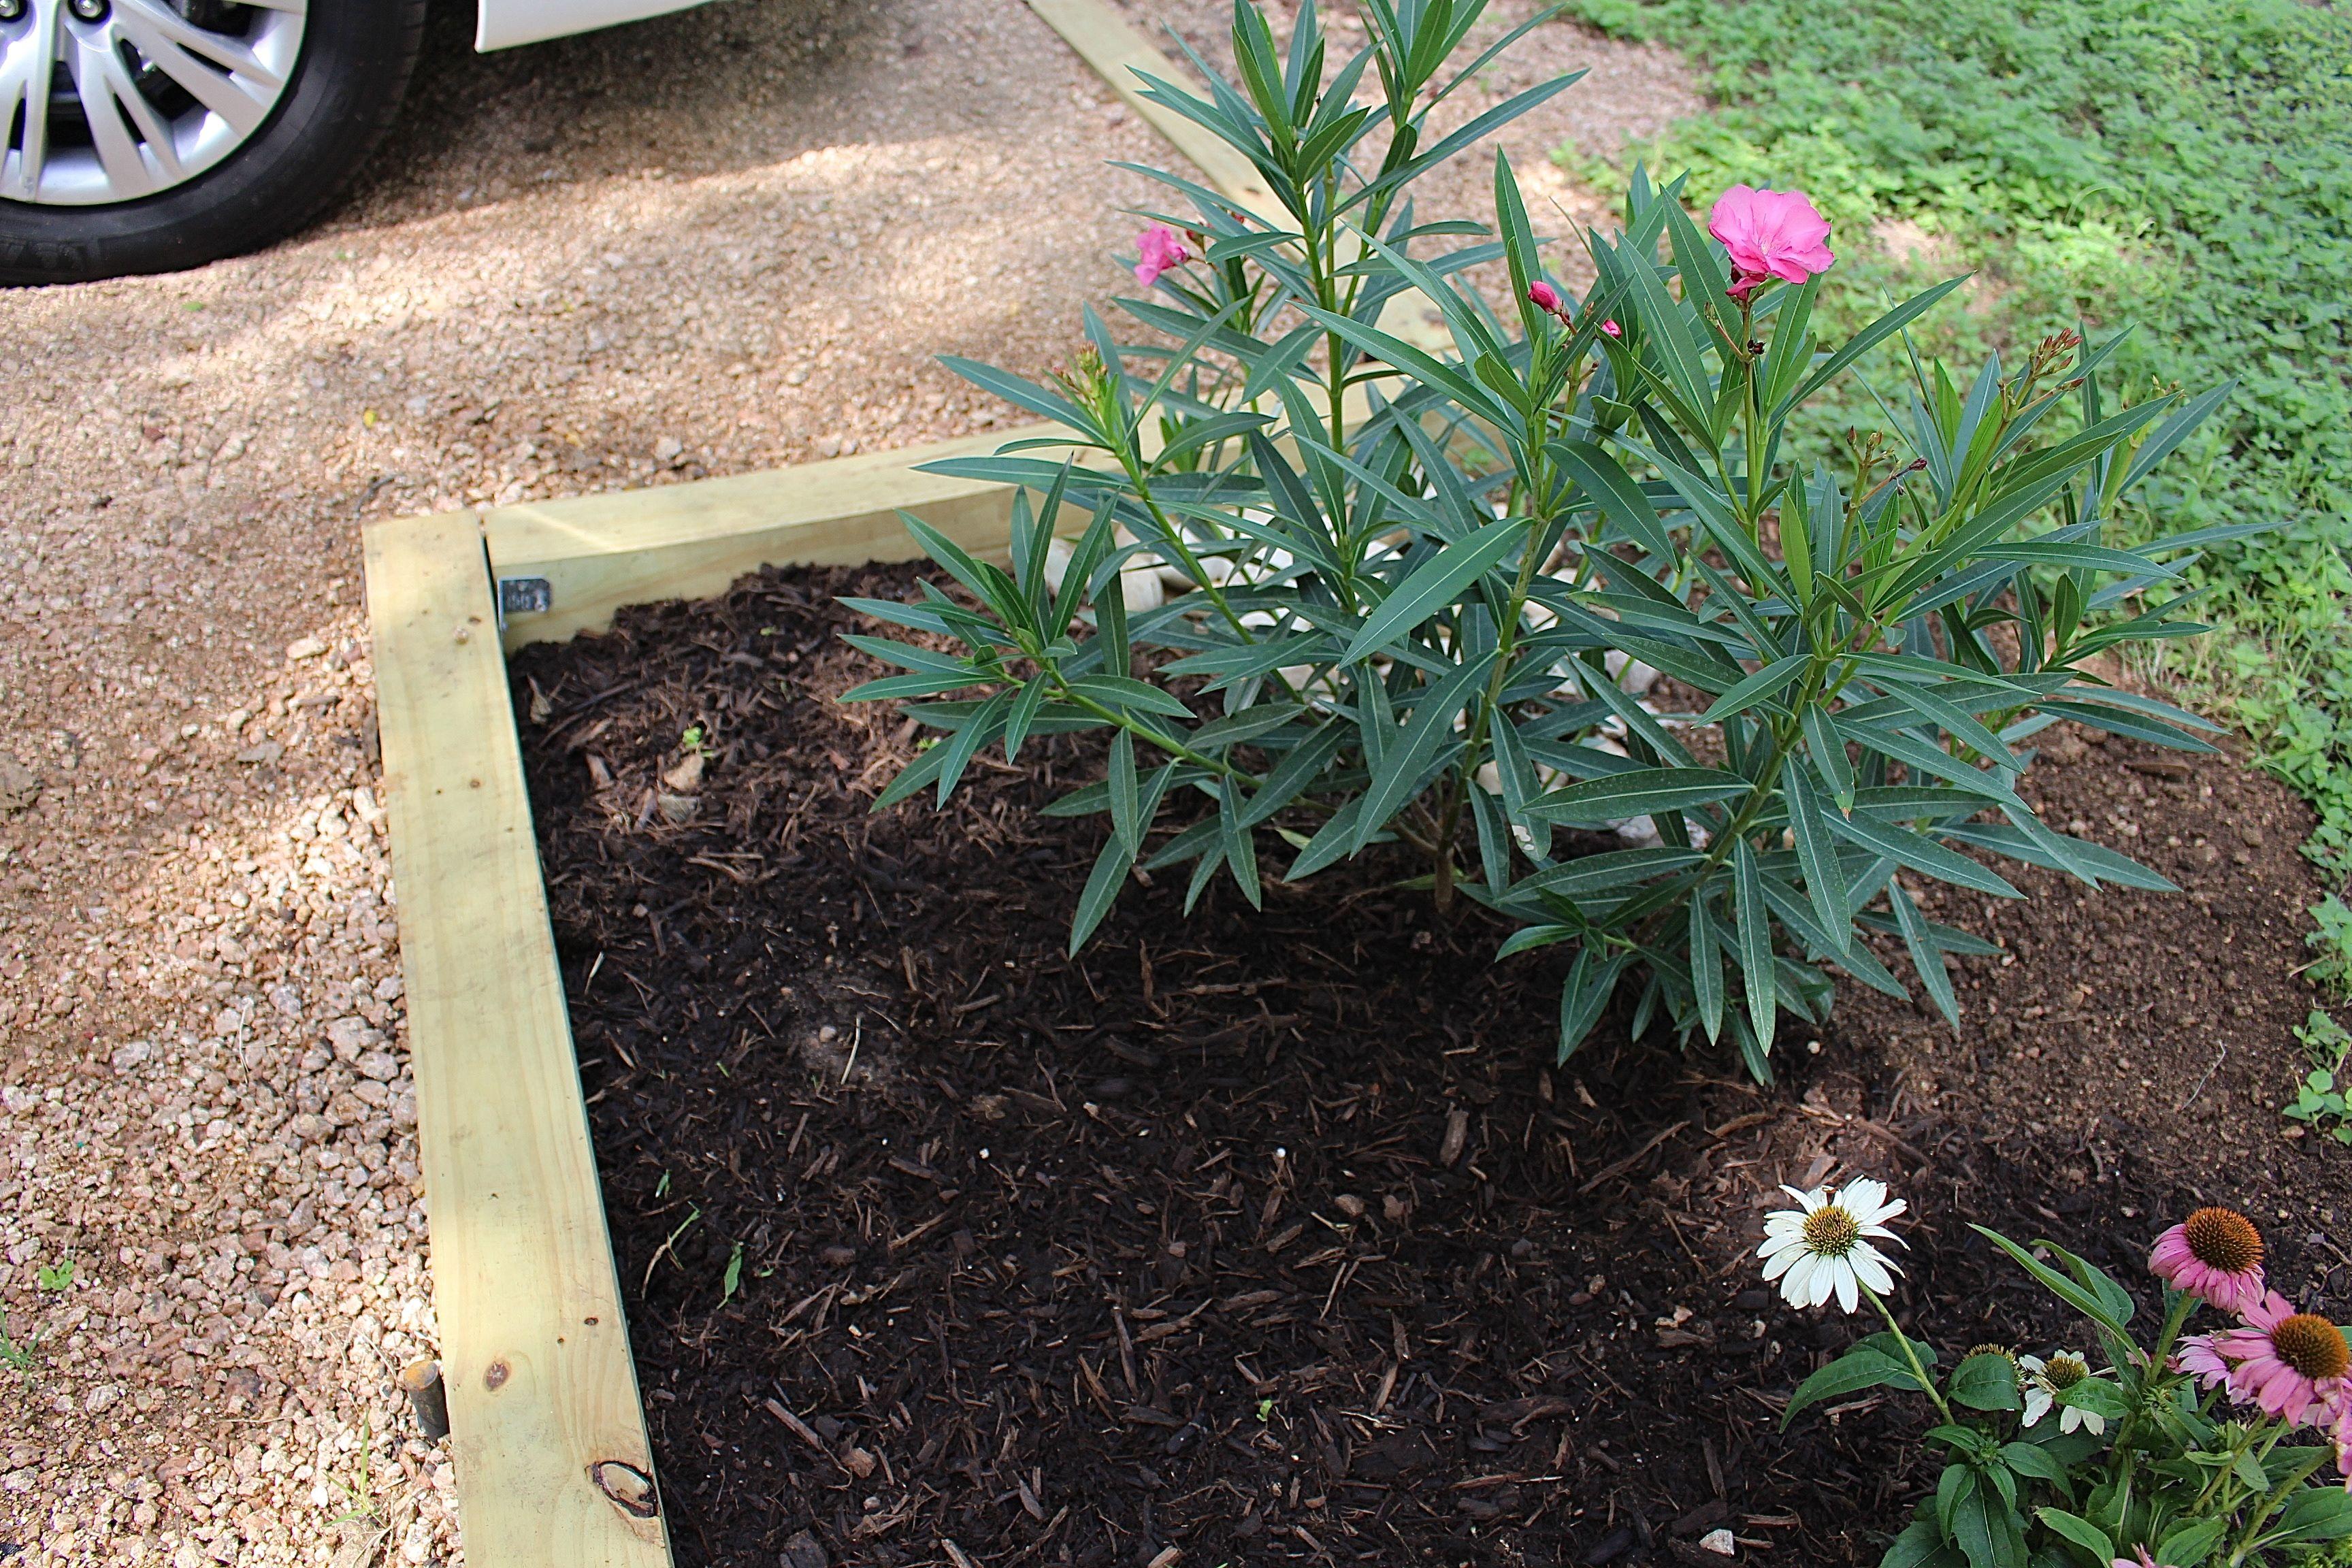 home depot return policy plants flowers shrubs garden yard and plate. Black Bedroom Furniture Sets. Home Design Ideas